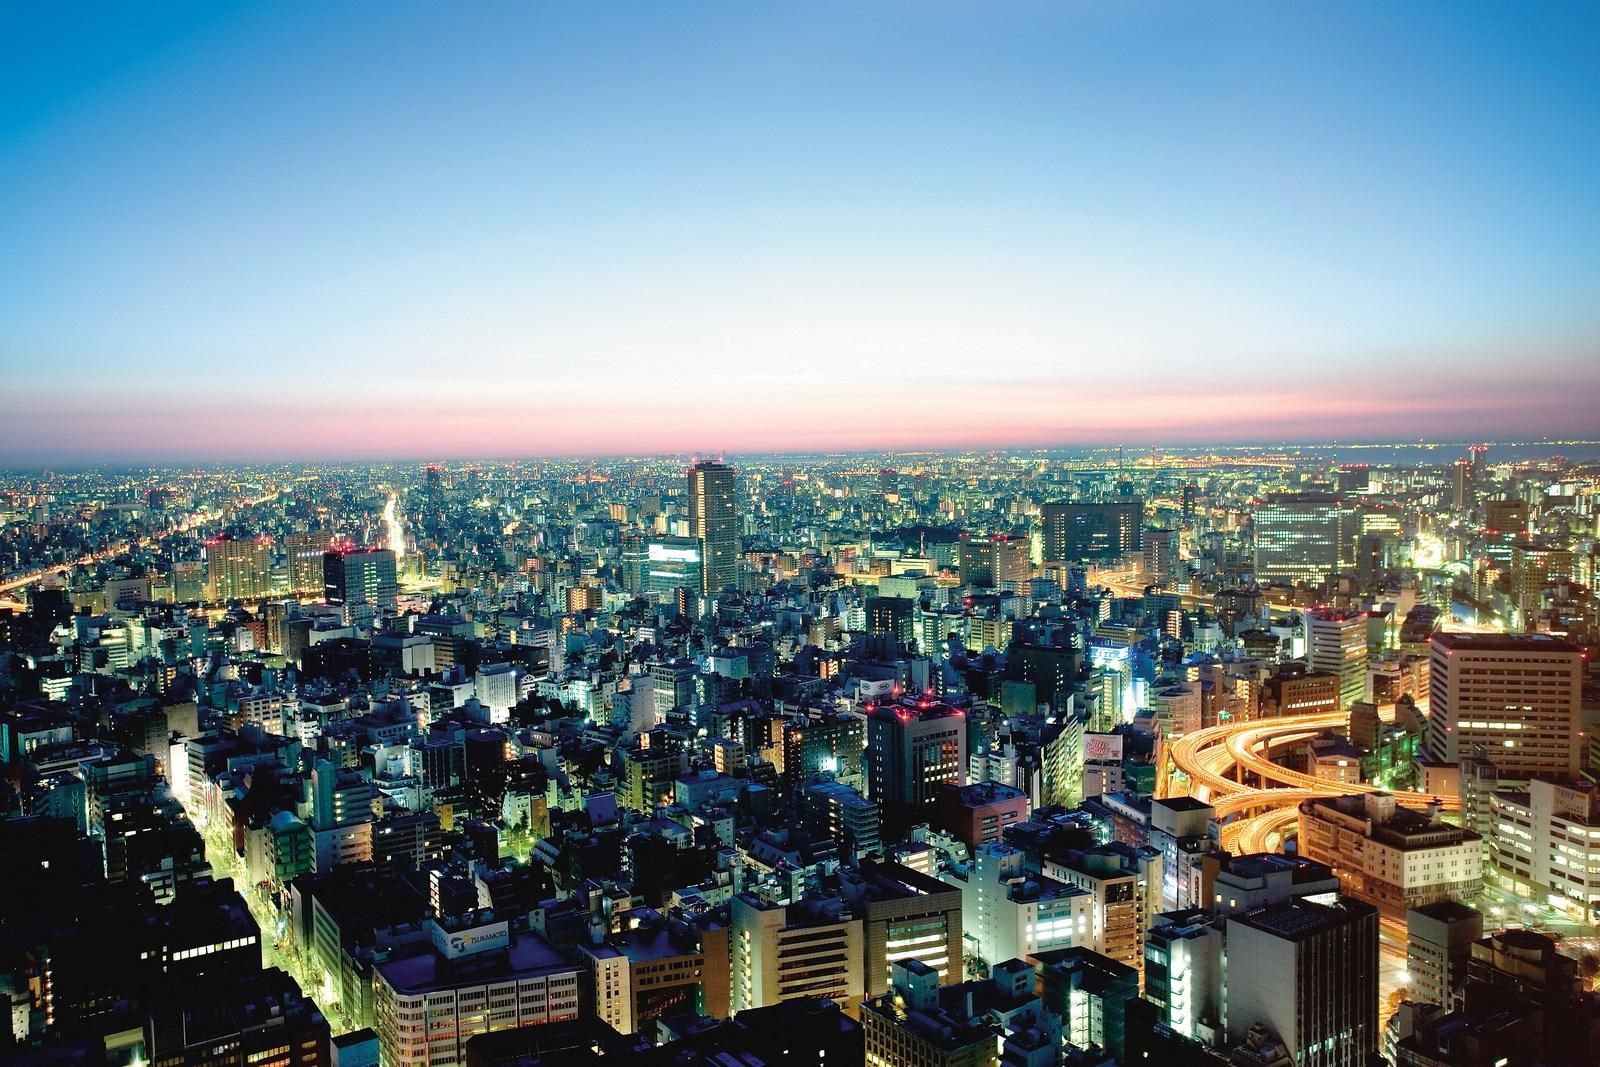 tokyo-exterior-view-01 [1600x1200]